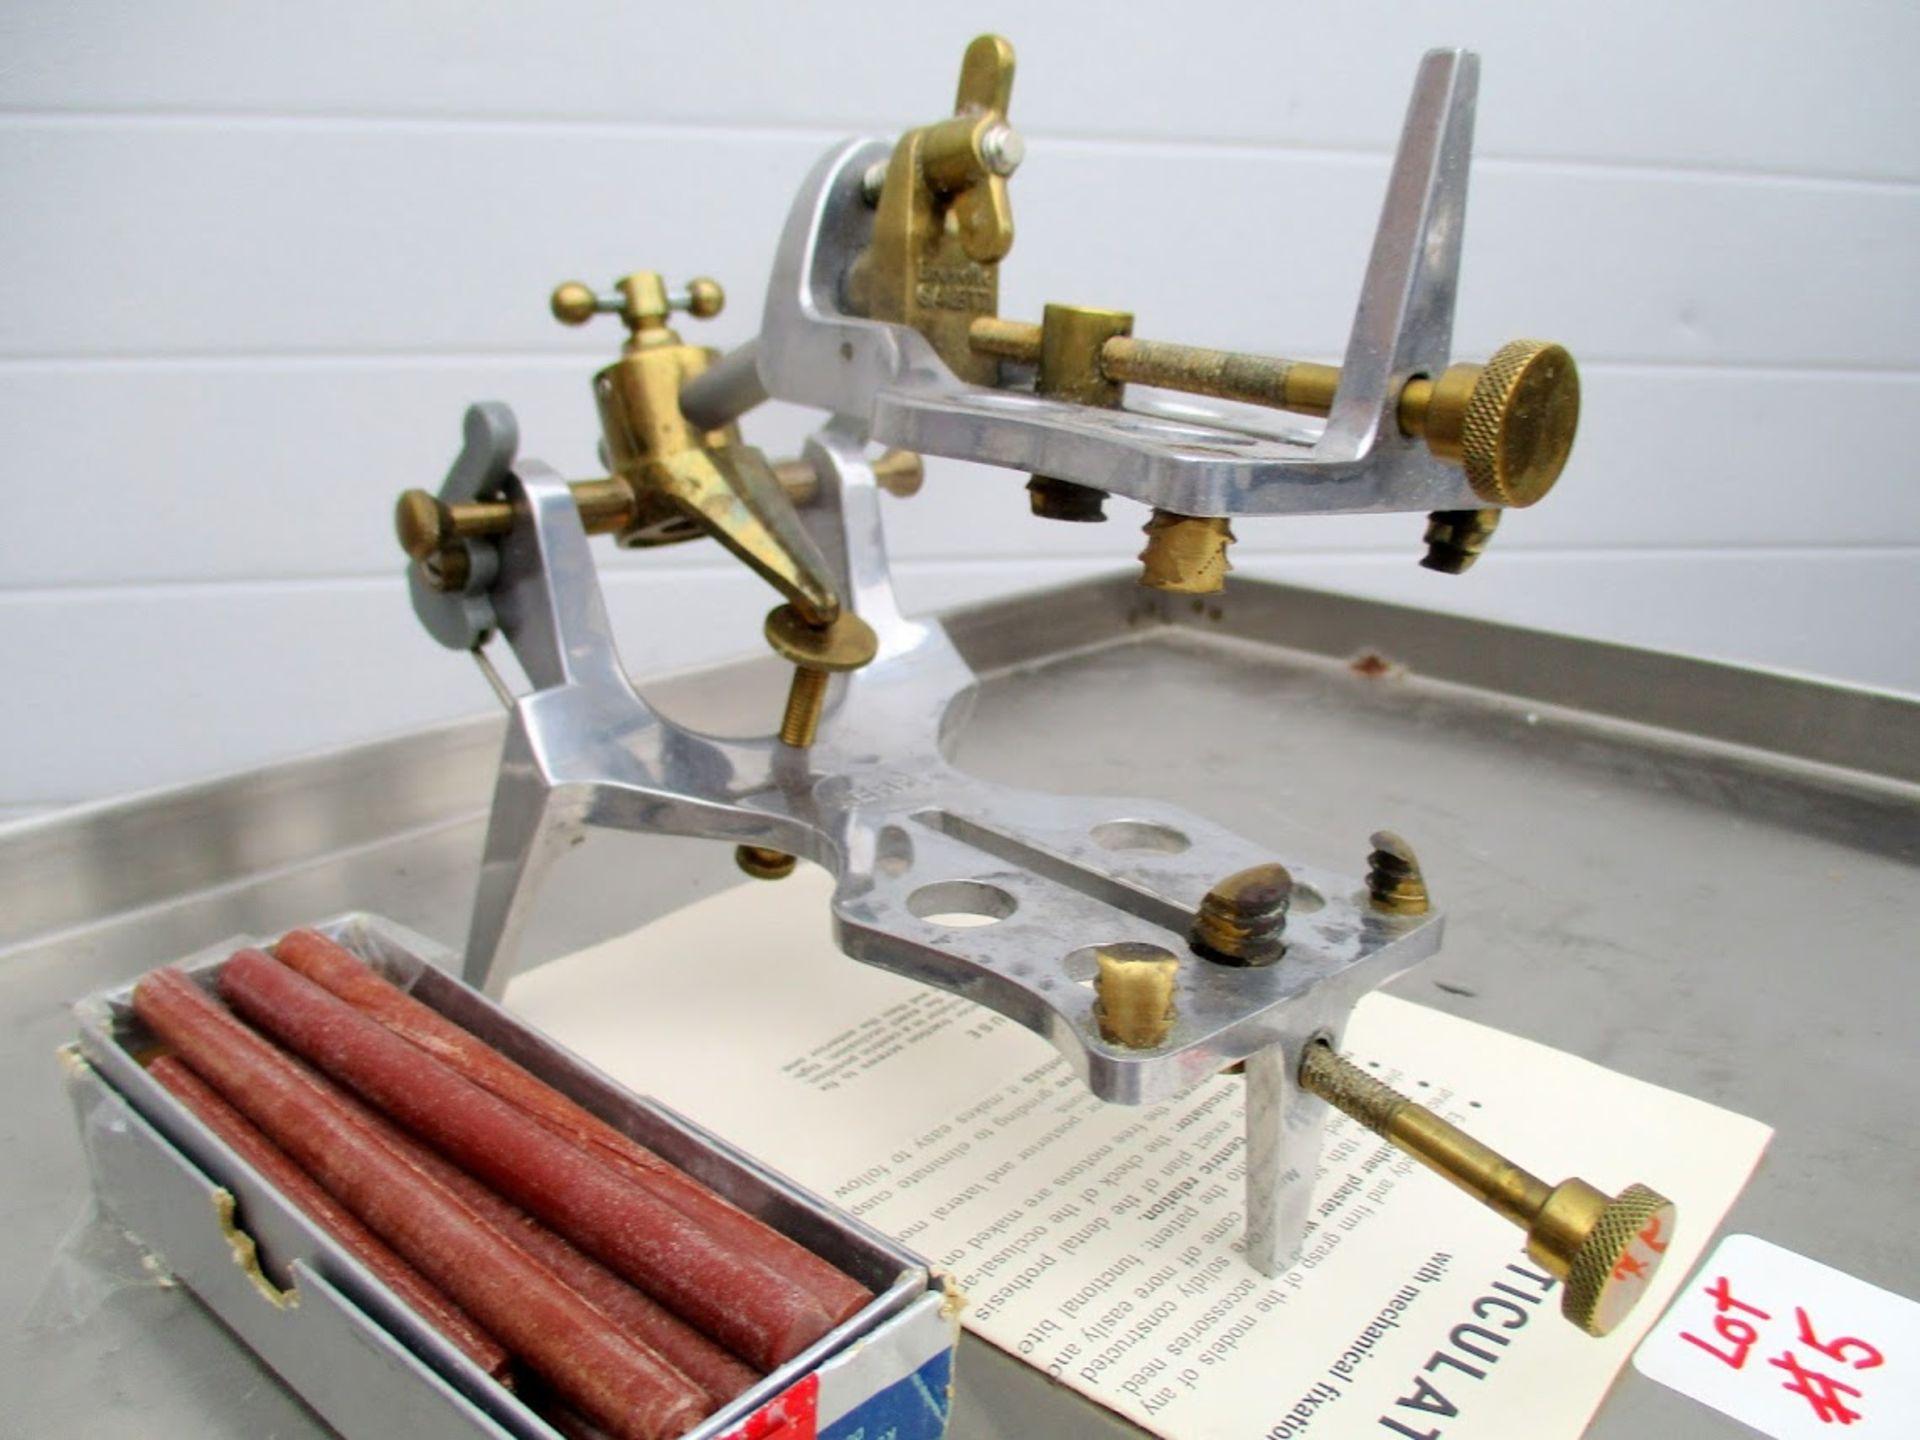 Dental Articulator tracing sticks - Image 2 of 3